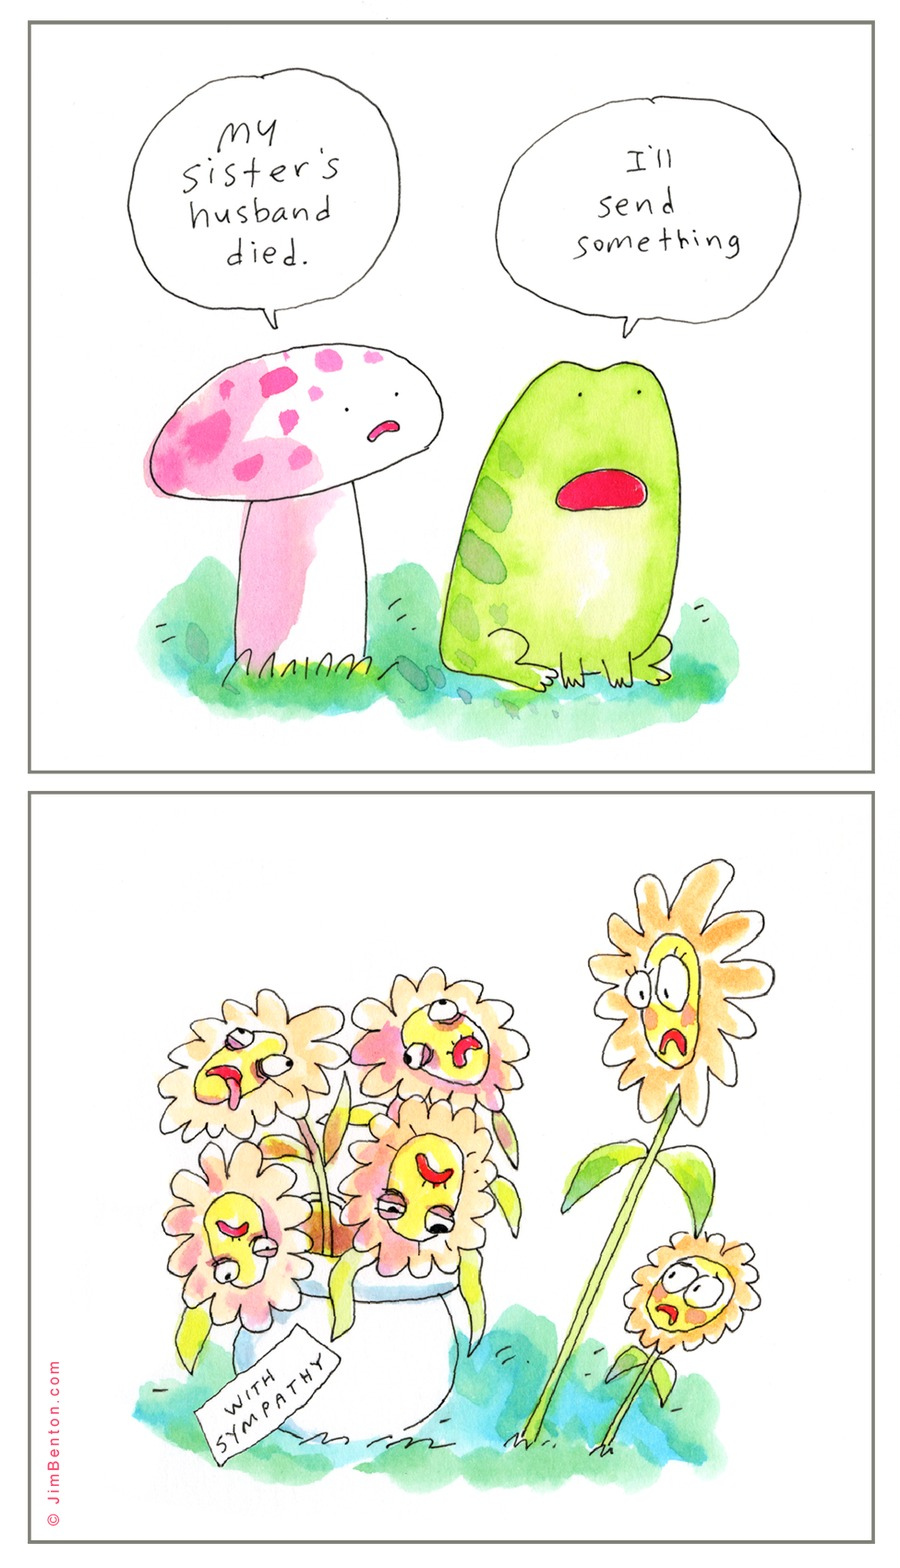 Mushroom: My sister's husband died.  Frog: I'll send something